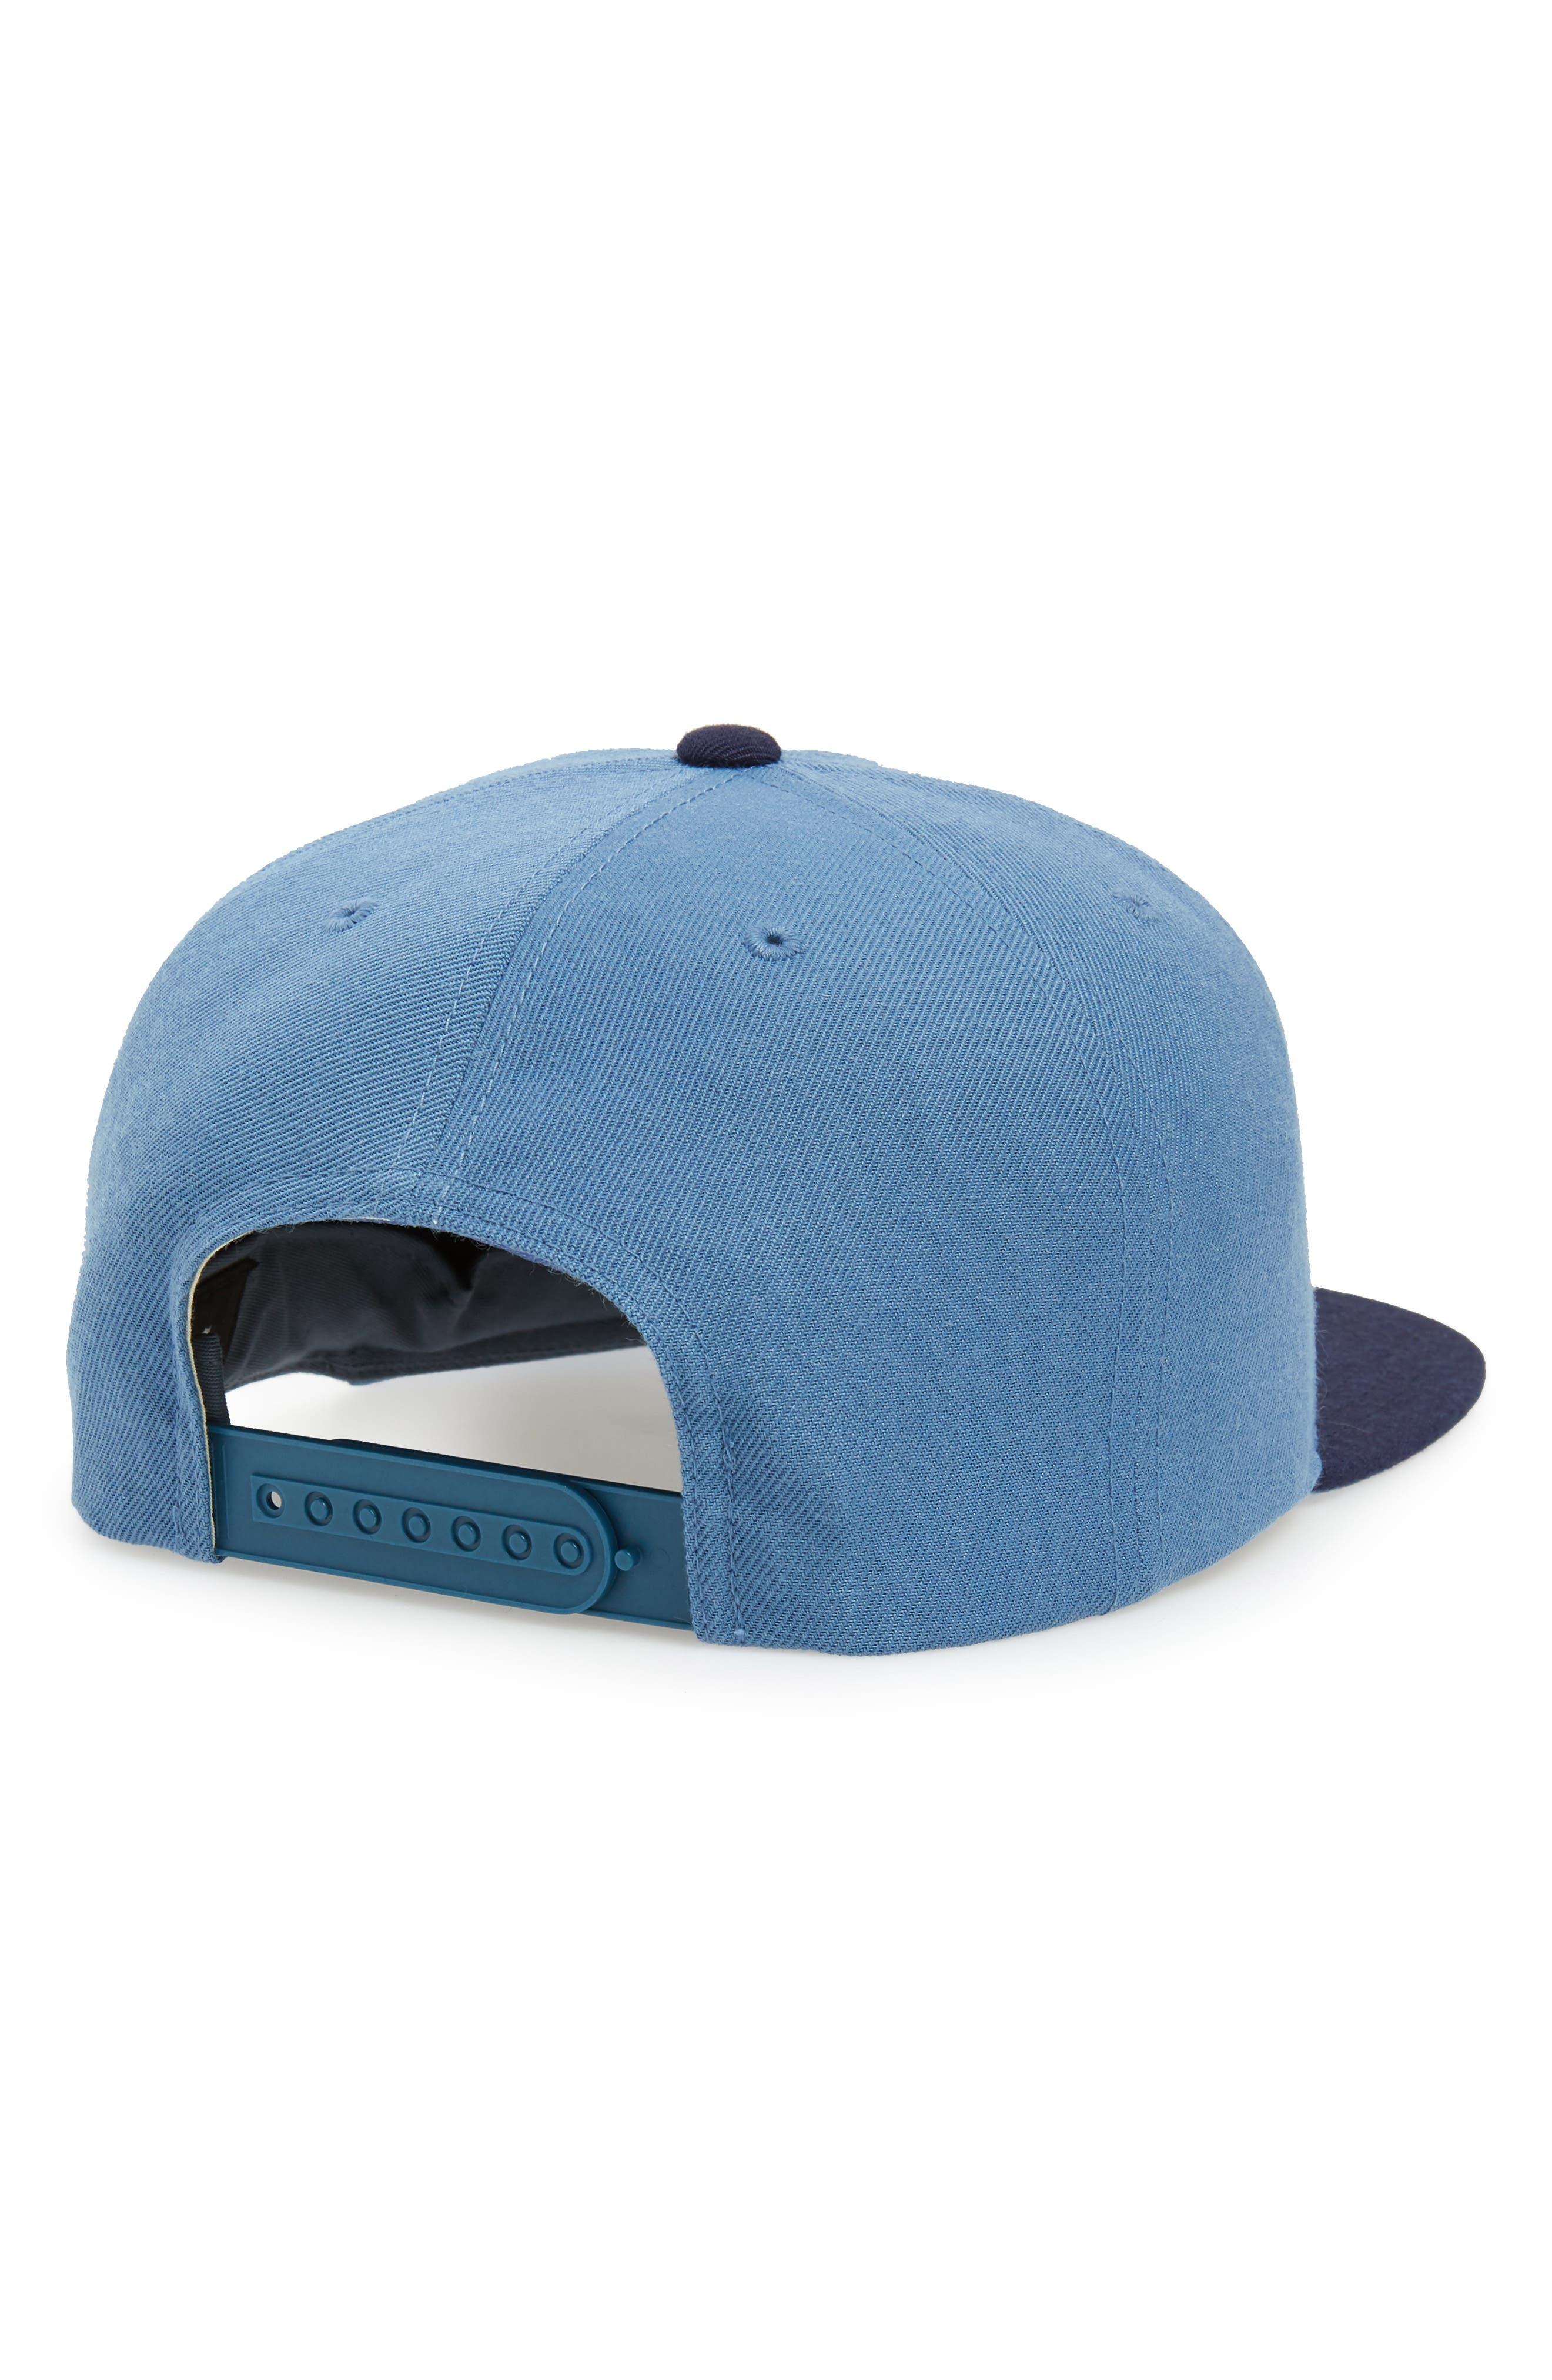 'Oath III' Snapback Cap,                             Alternate thumbnail 2, color,                             GREY BLUE/ NAVY